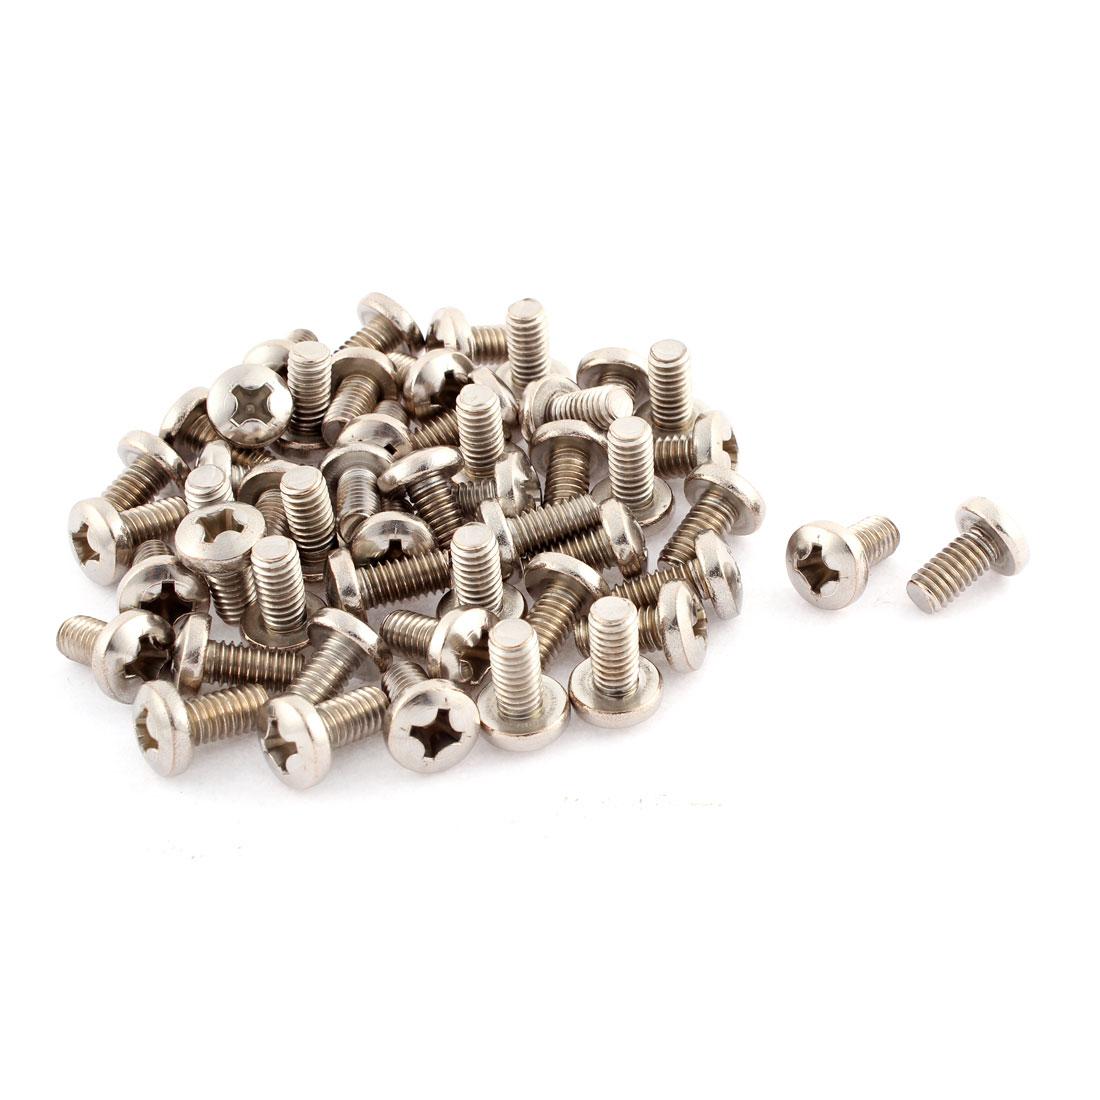 "21mm Long 5/16""x18x5/8"" Stainless Steel Phillips Truss Head Screws 50 Pcs"